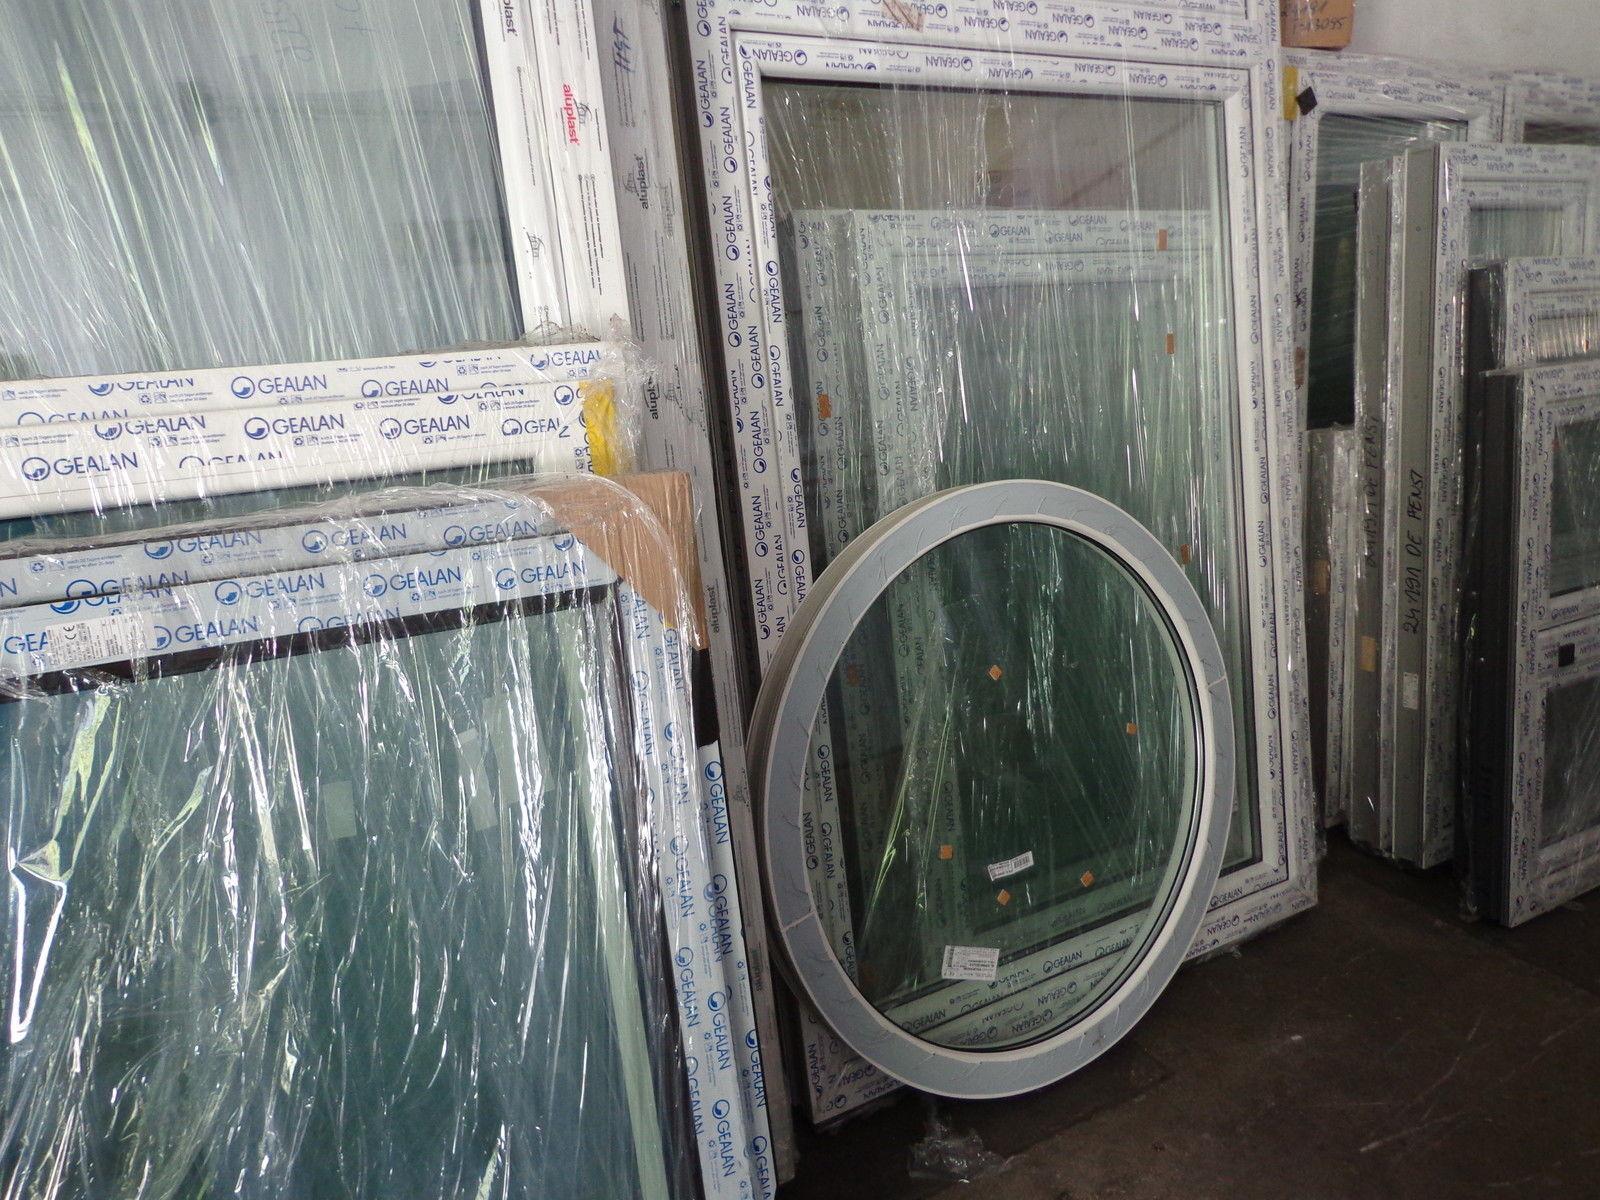 Gealan 8000 Top Preise Top Qualitat Fenster aus Polen Kunststofffenster